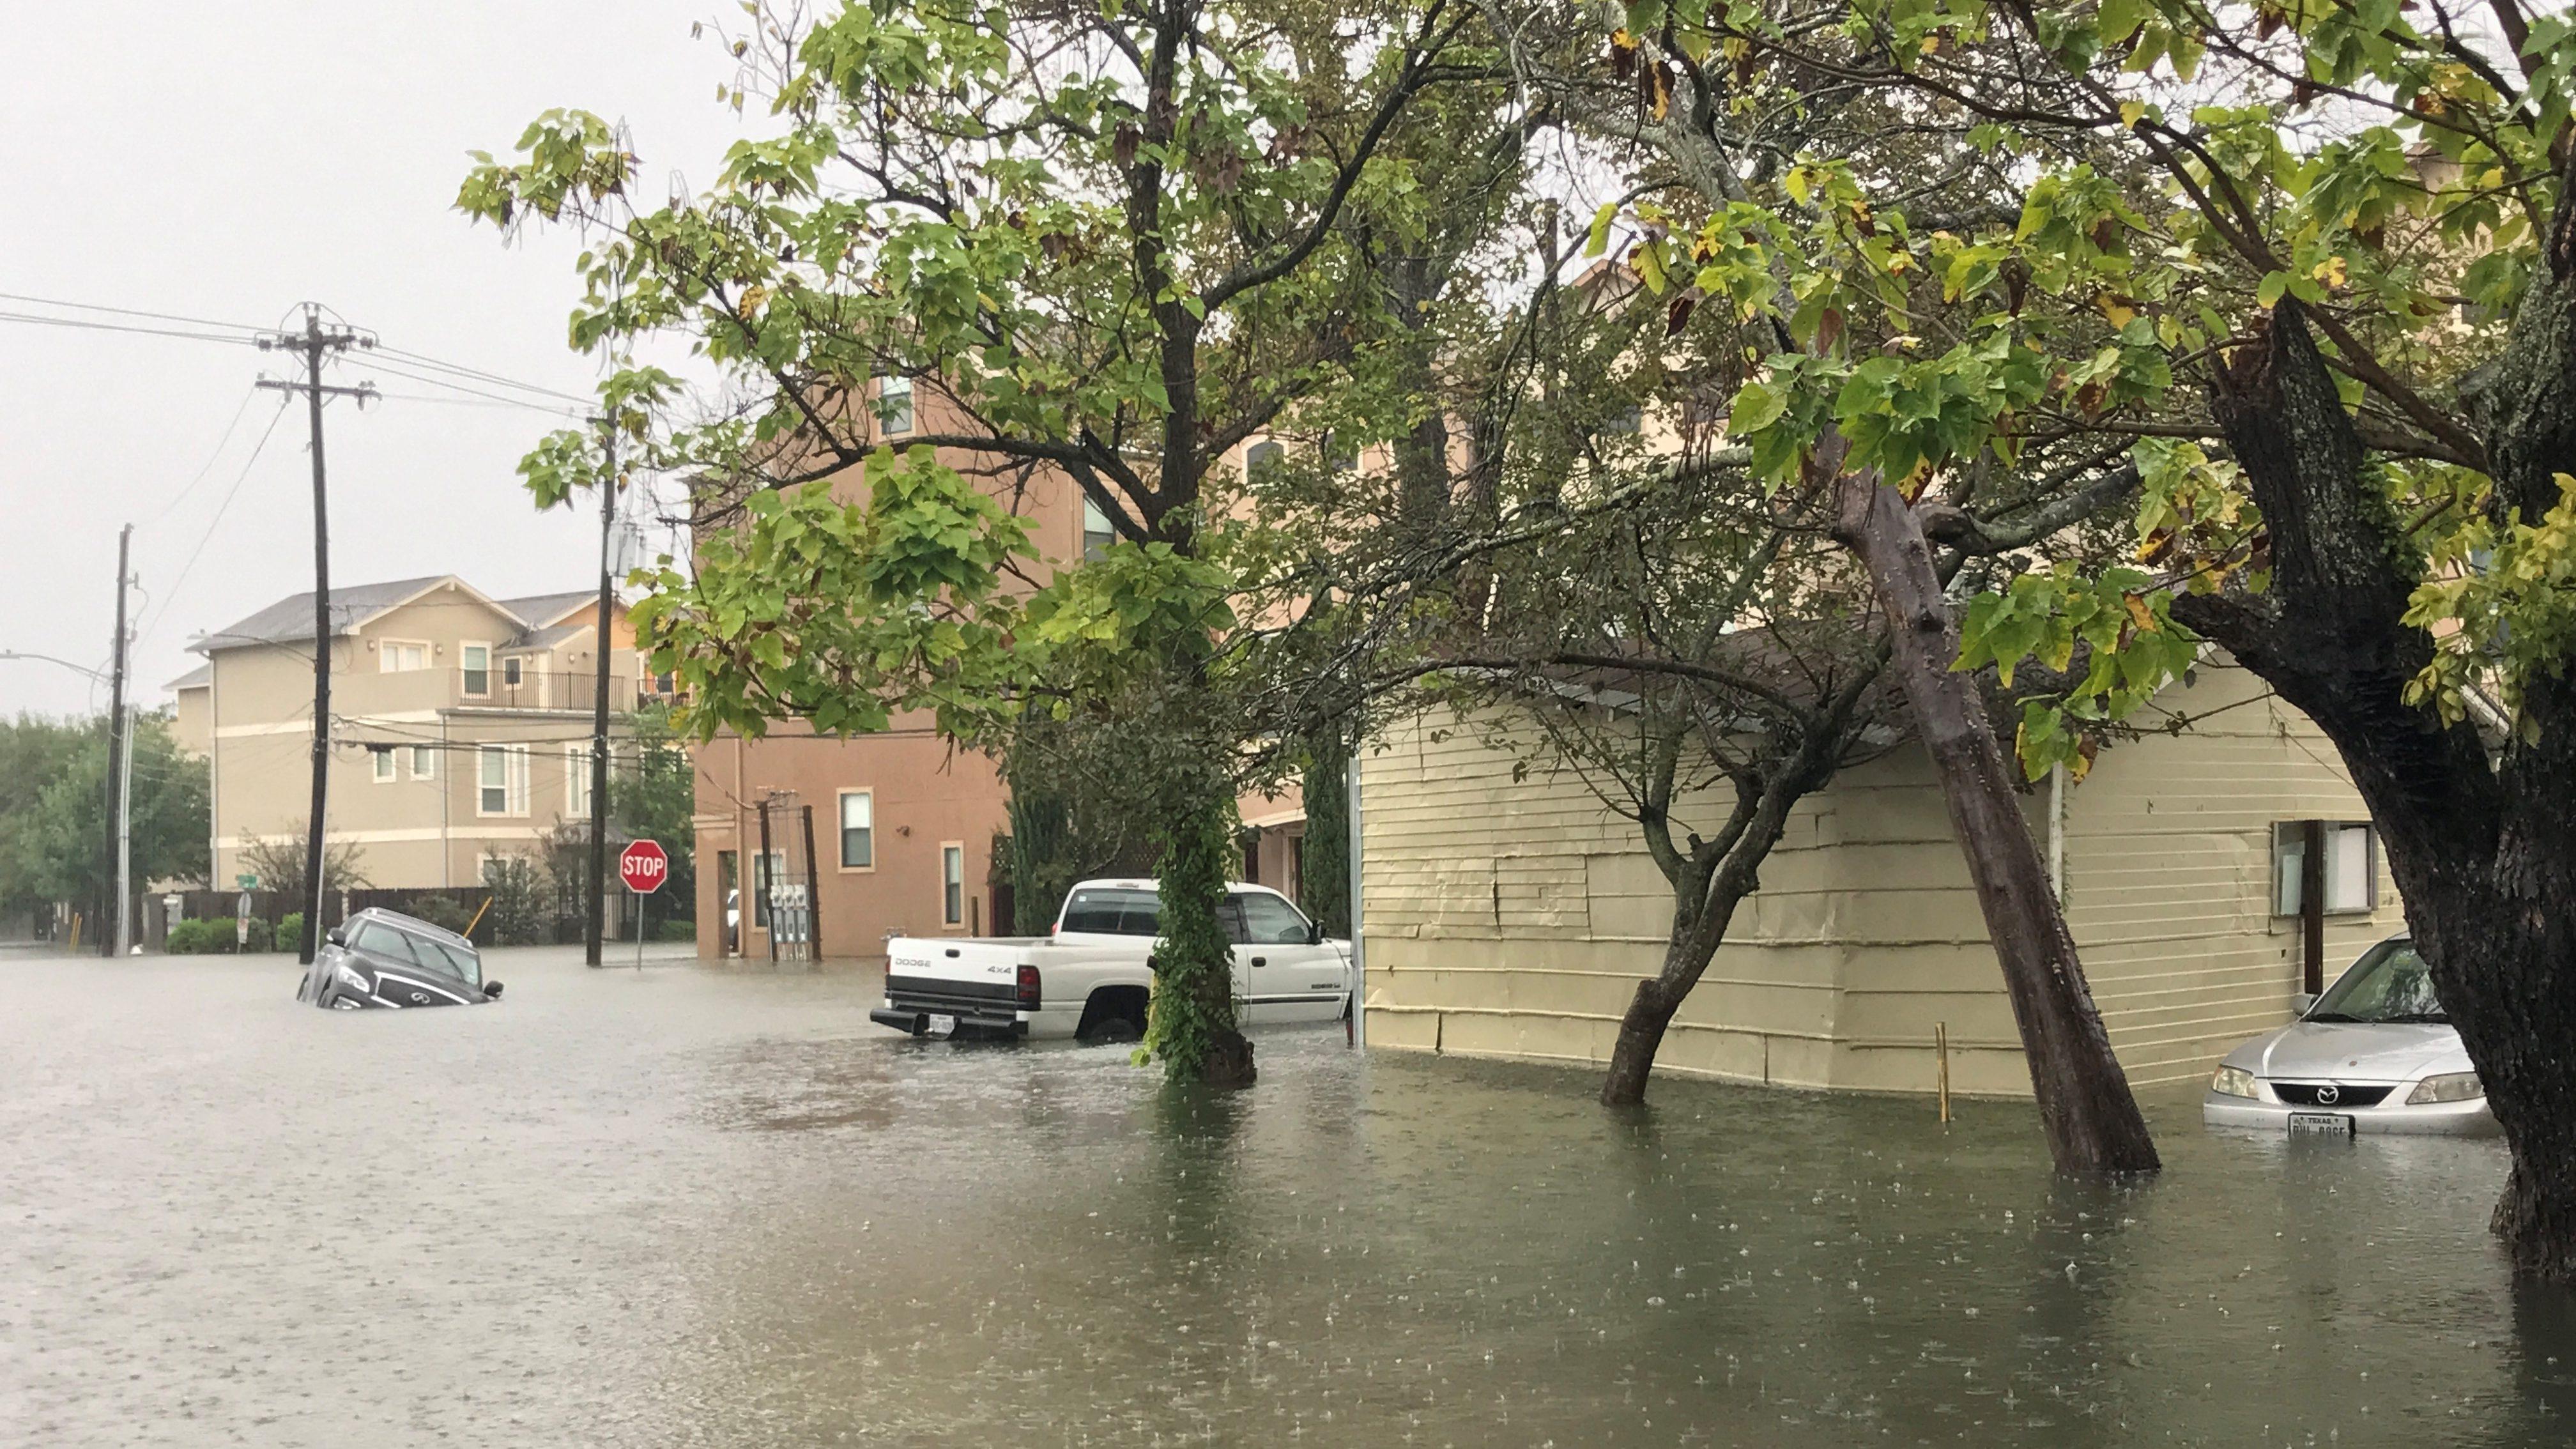 Hurricane Harvey Why 85 of homeowners in